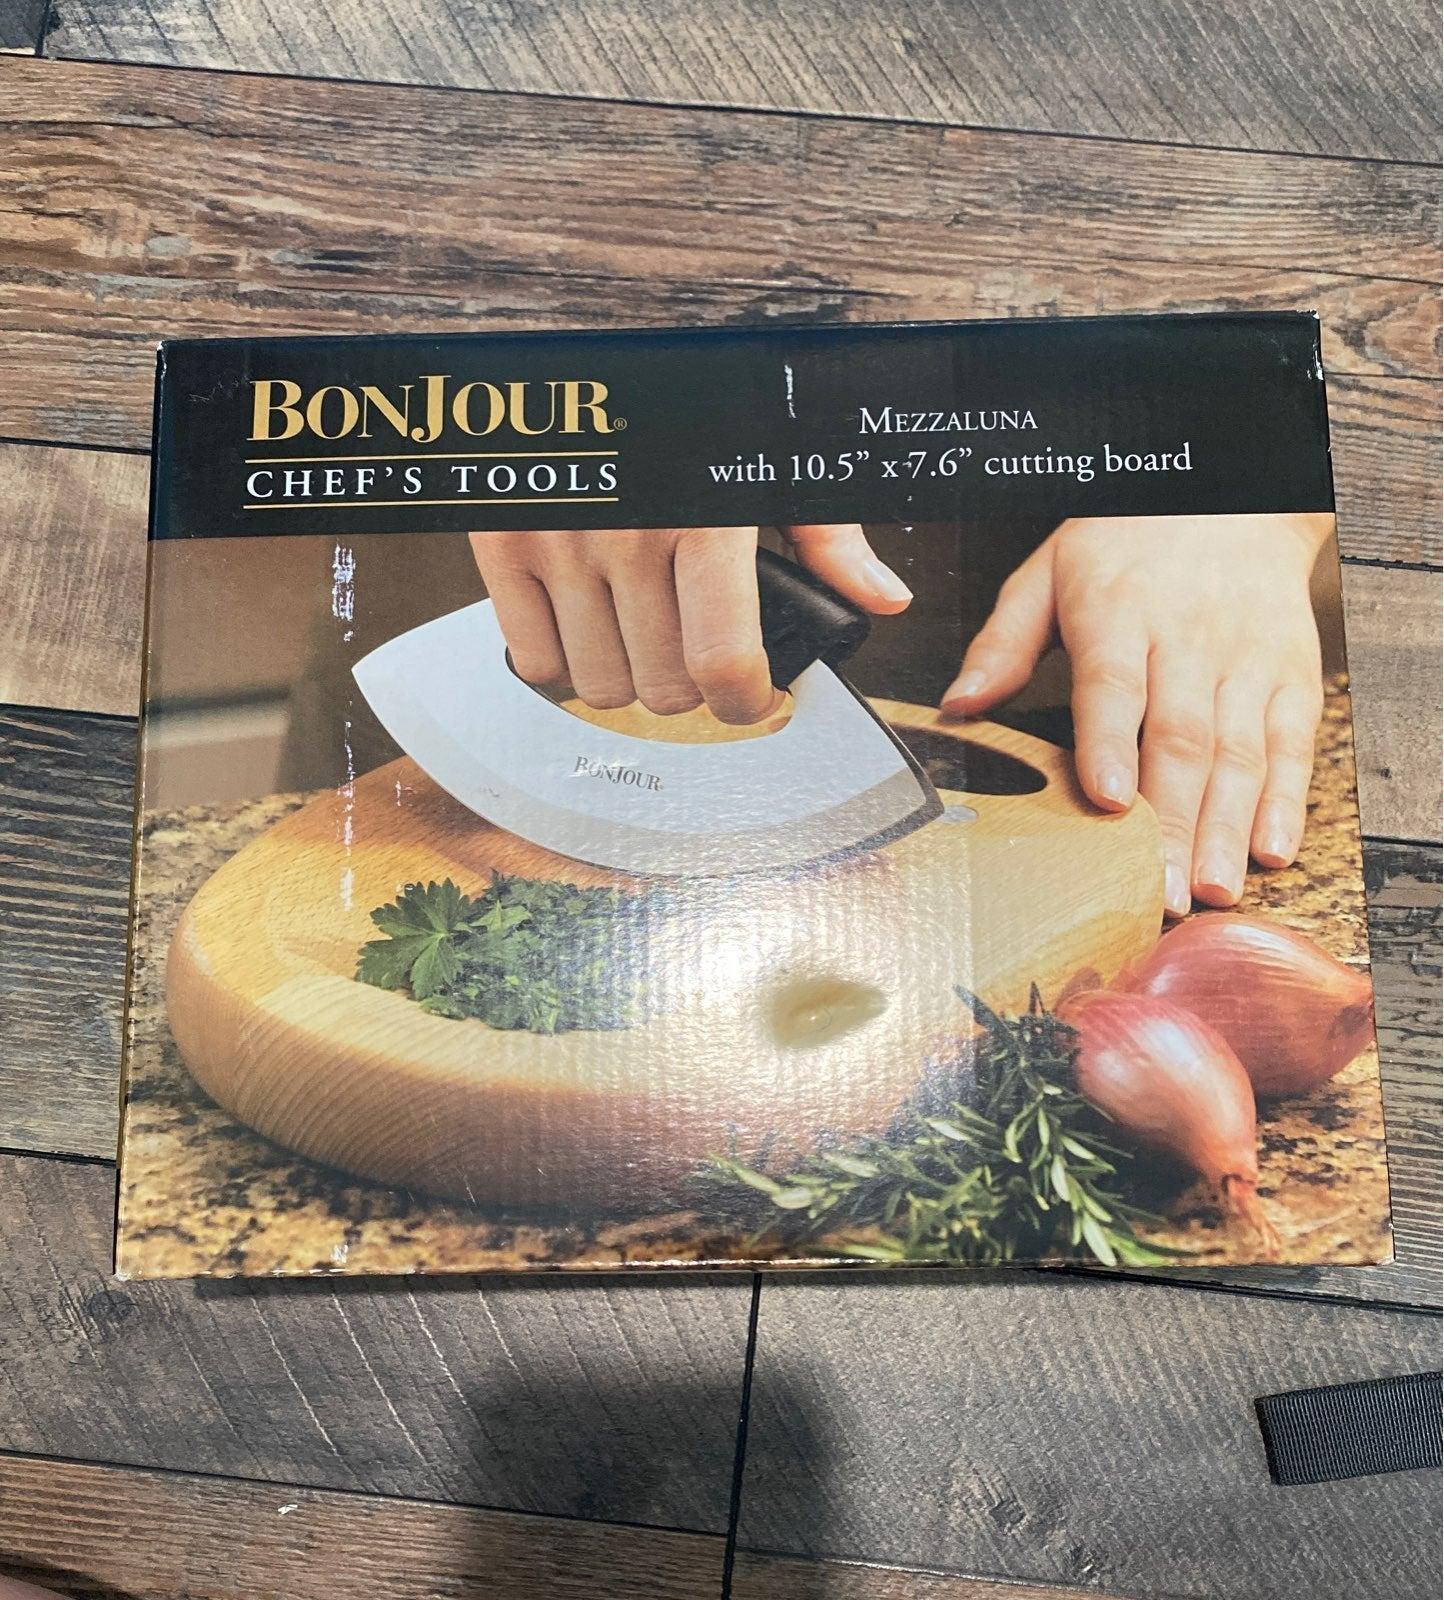 BonJour chefs tools